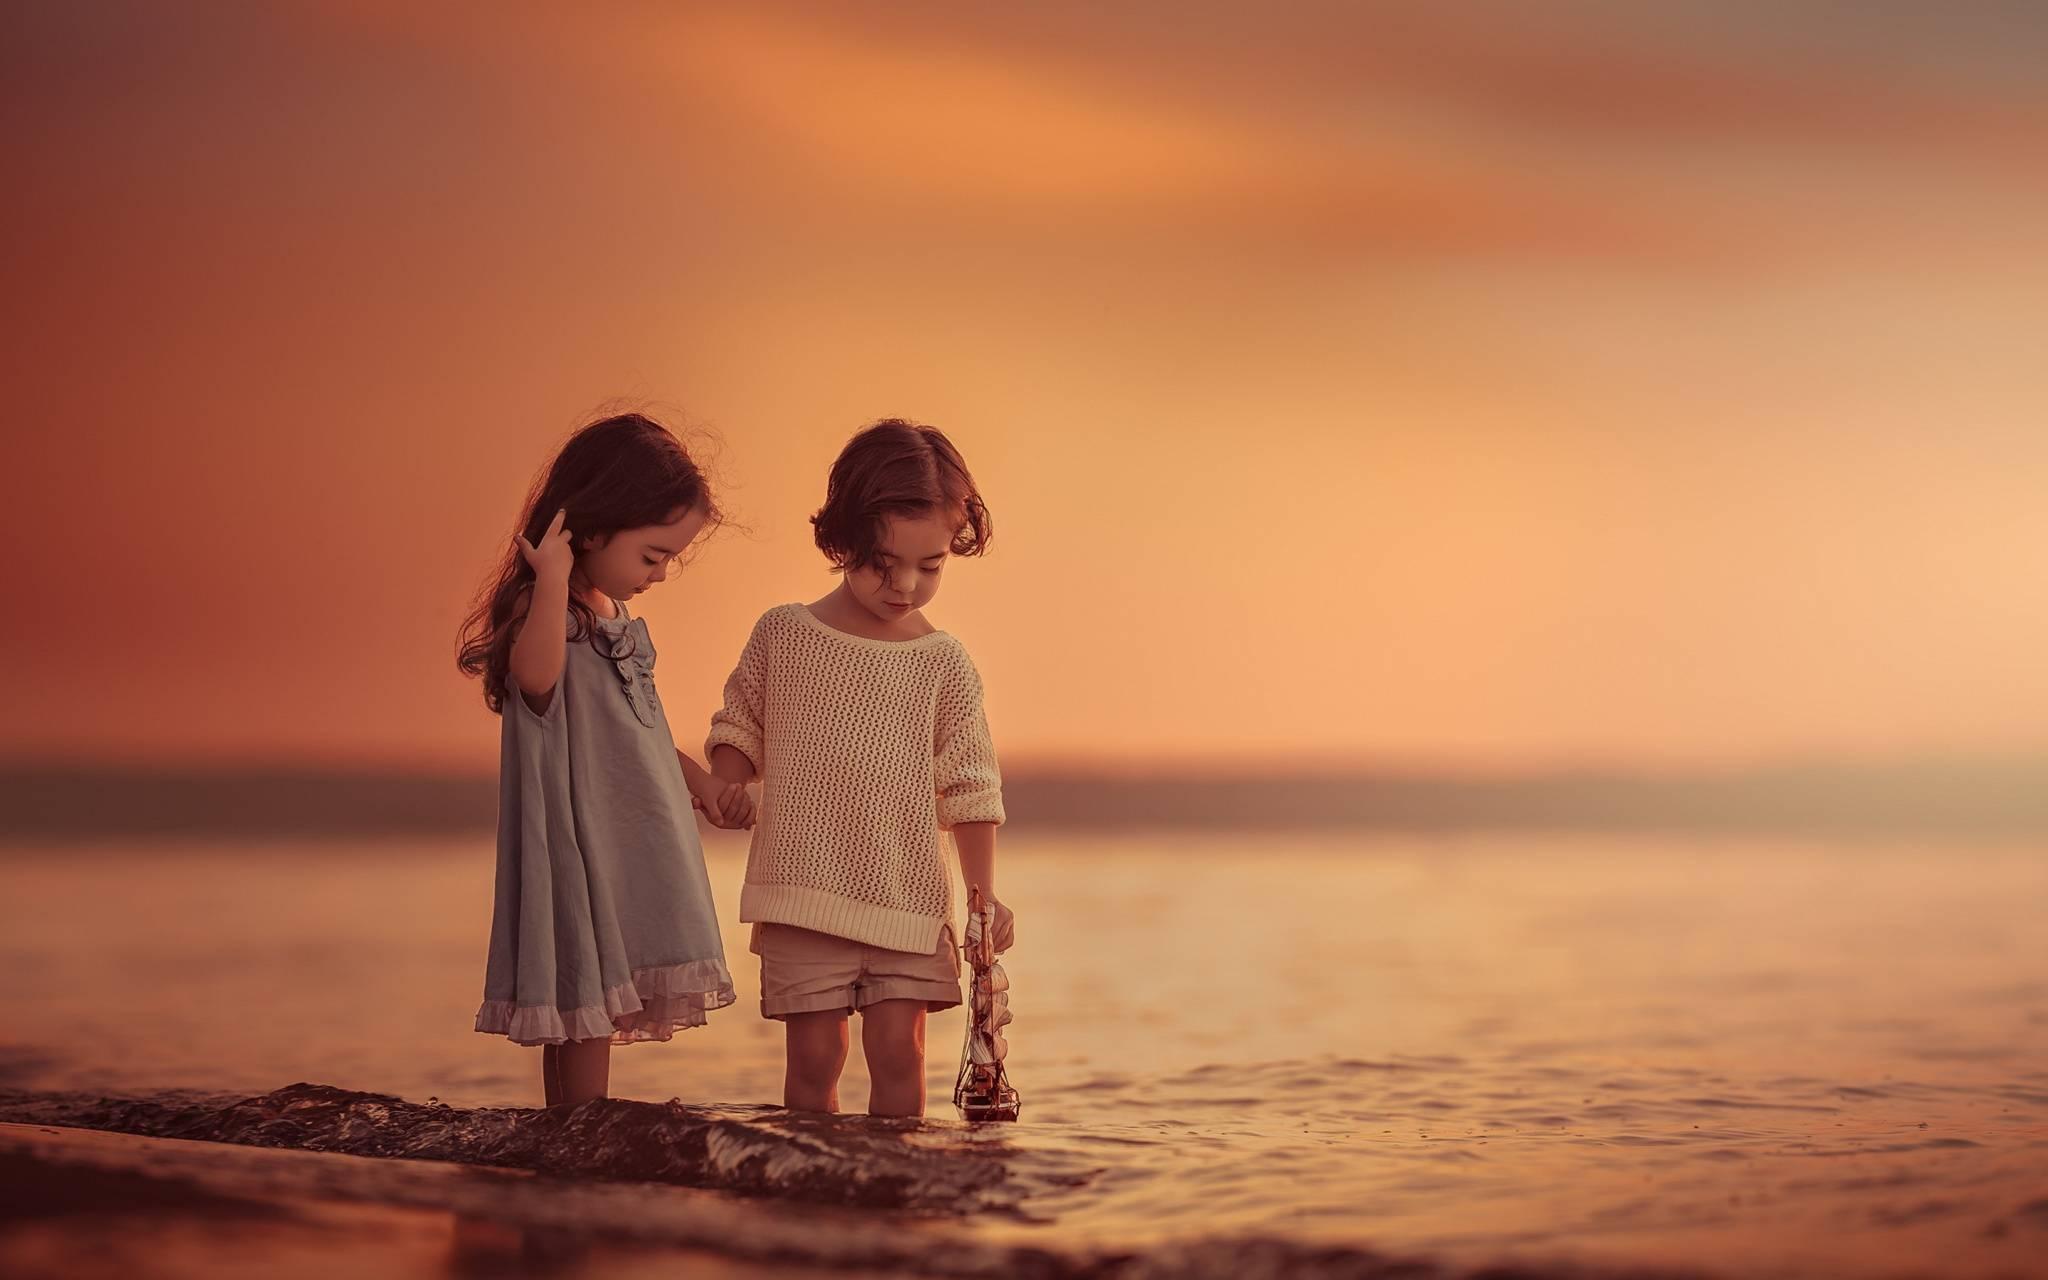 Sea Sunset children